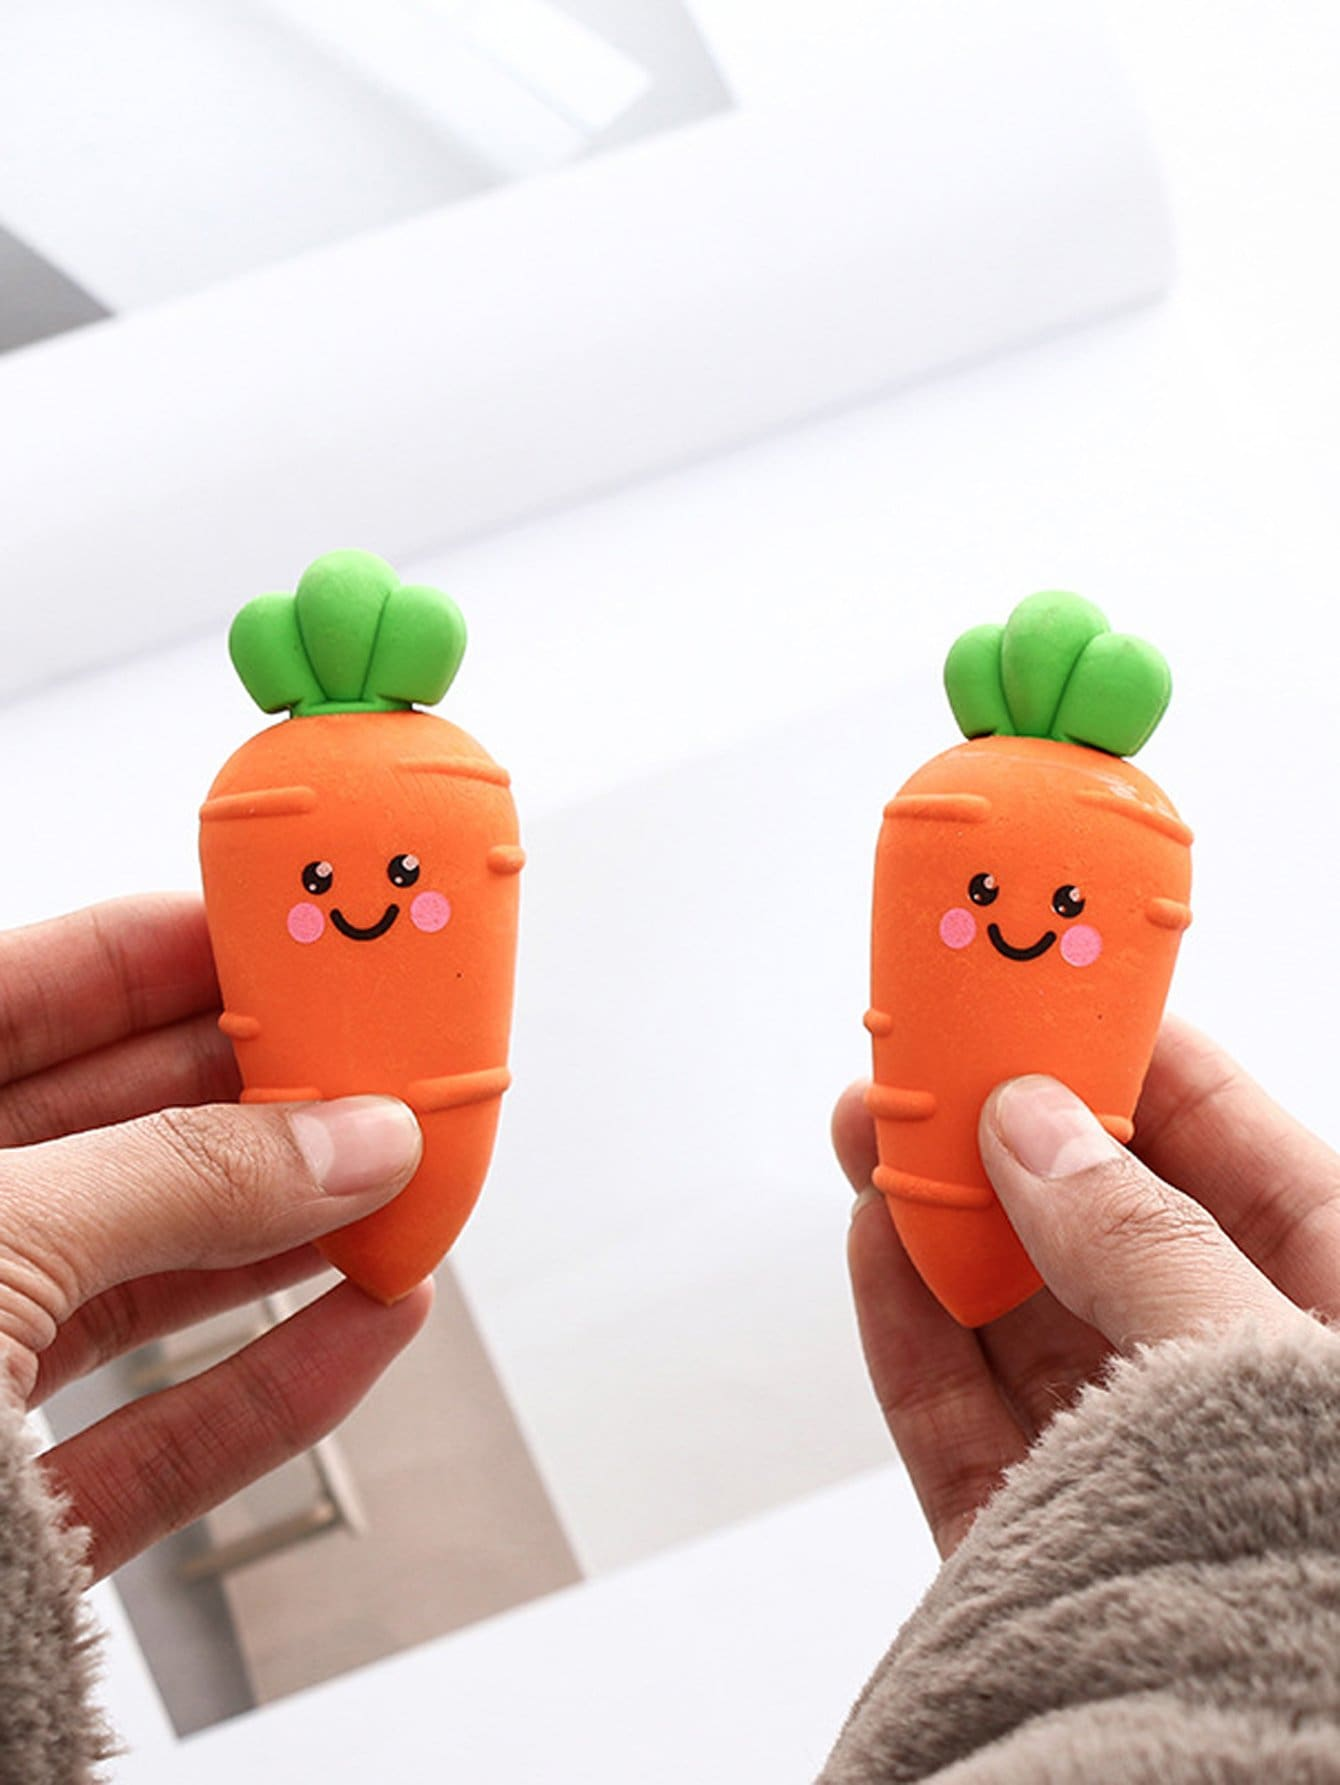 Carrot Shaped Eraser 1pc crocodile shaped eraser green grey 2 pcs